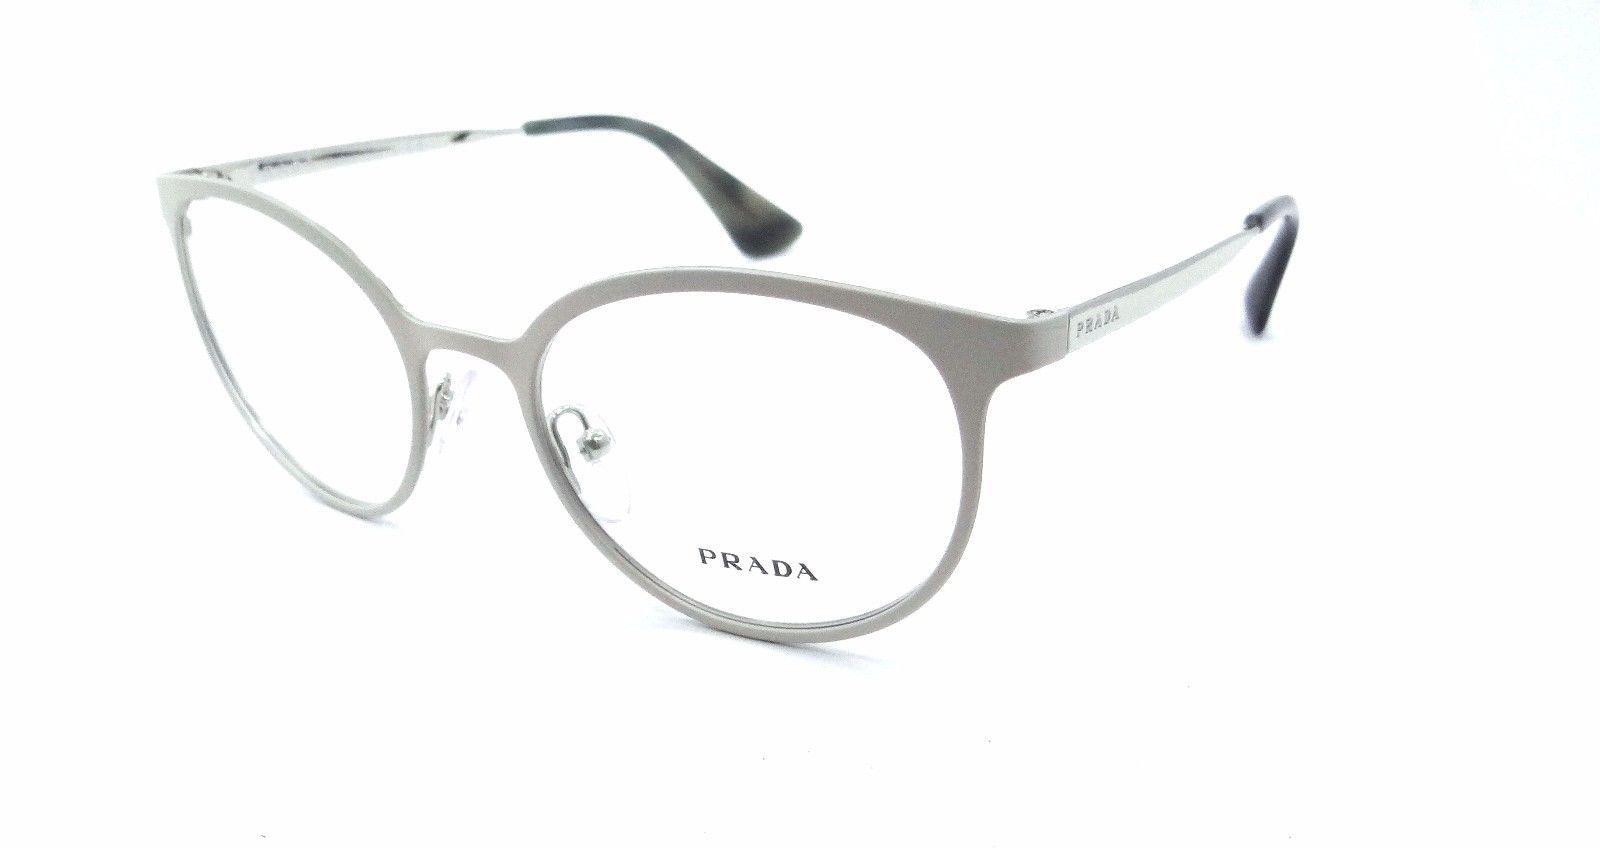 5611ce4cfd Prada Rx Eyeglasses Frames Vpr 53T U6Q-1o1 and 25 similar items